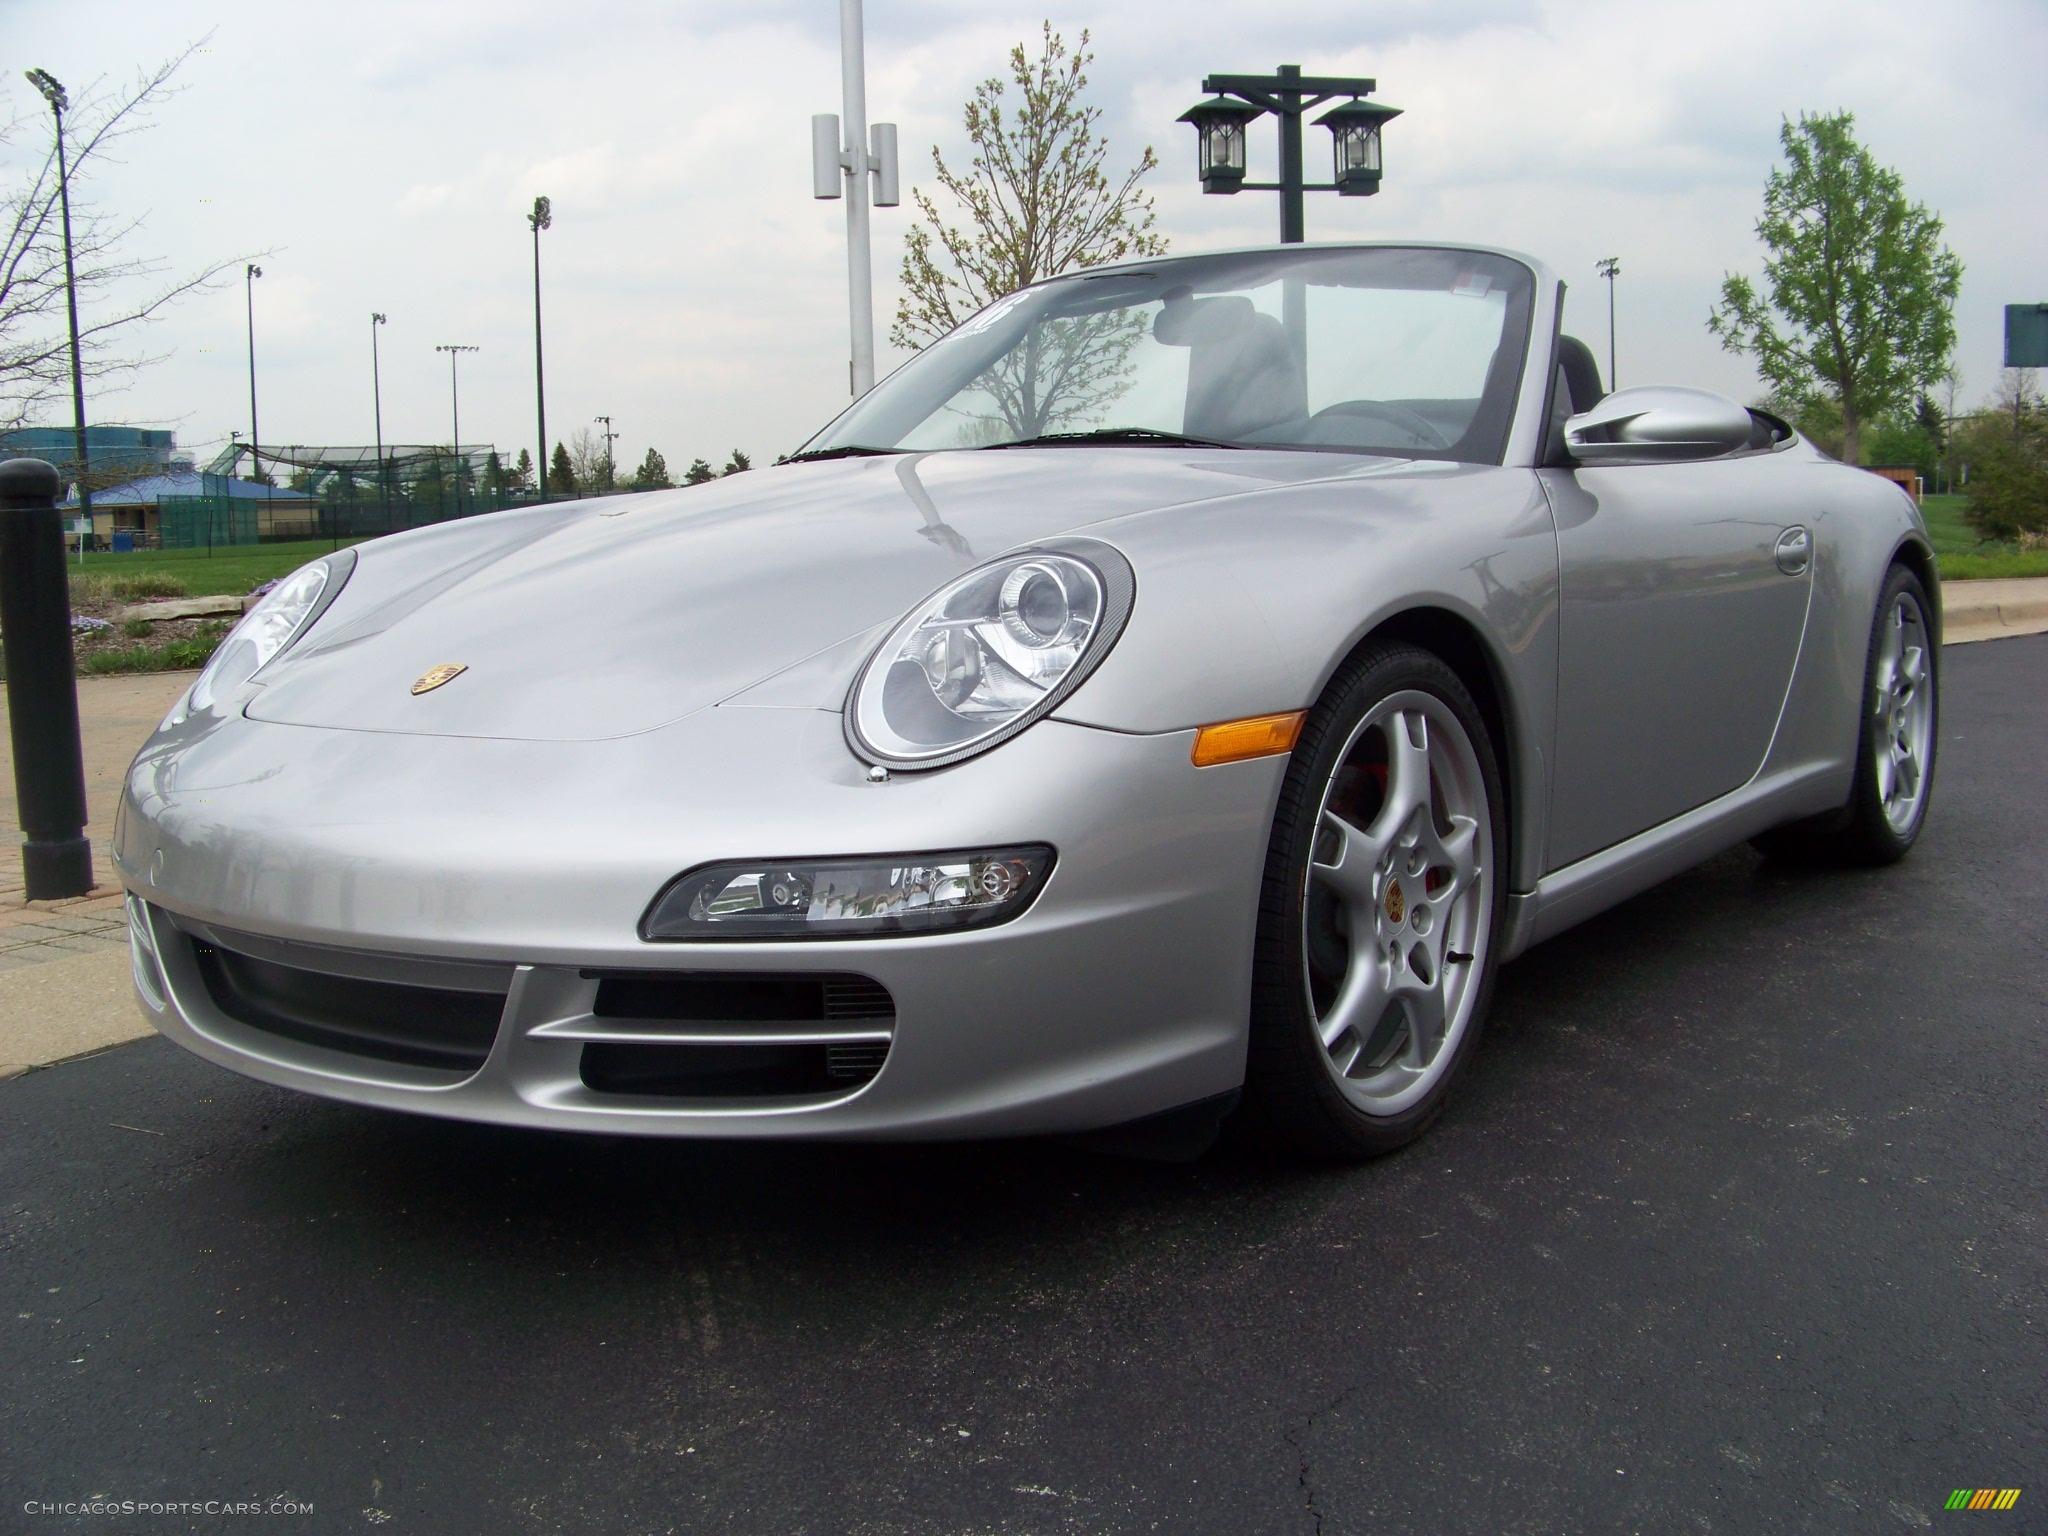 2006 porsche 911 carrera s cabriolet in arctic silver metallic 768052. Black Bedroom Furniture Sets. Home Design Ideas